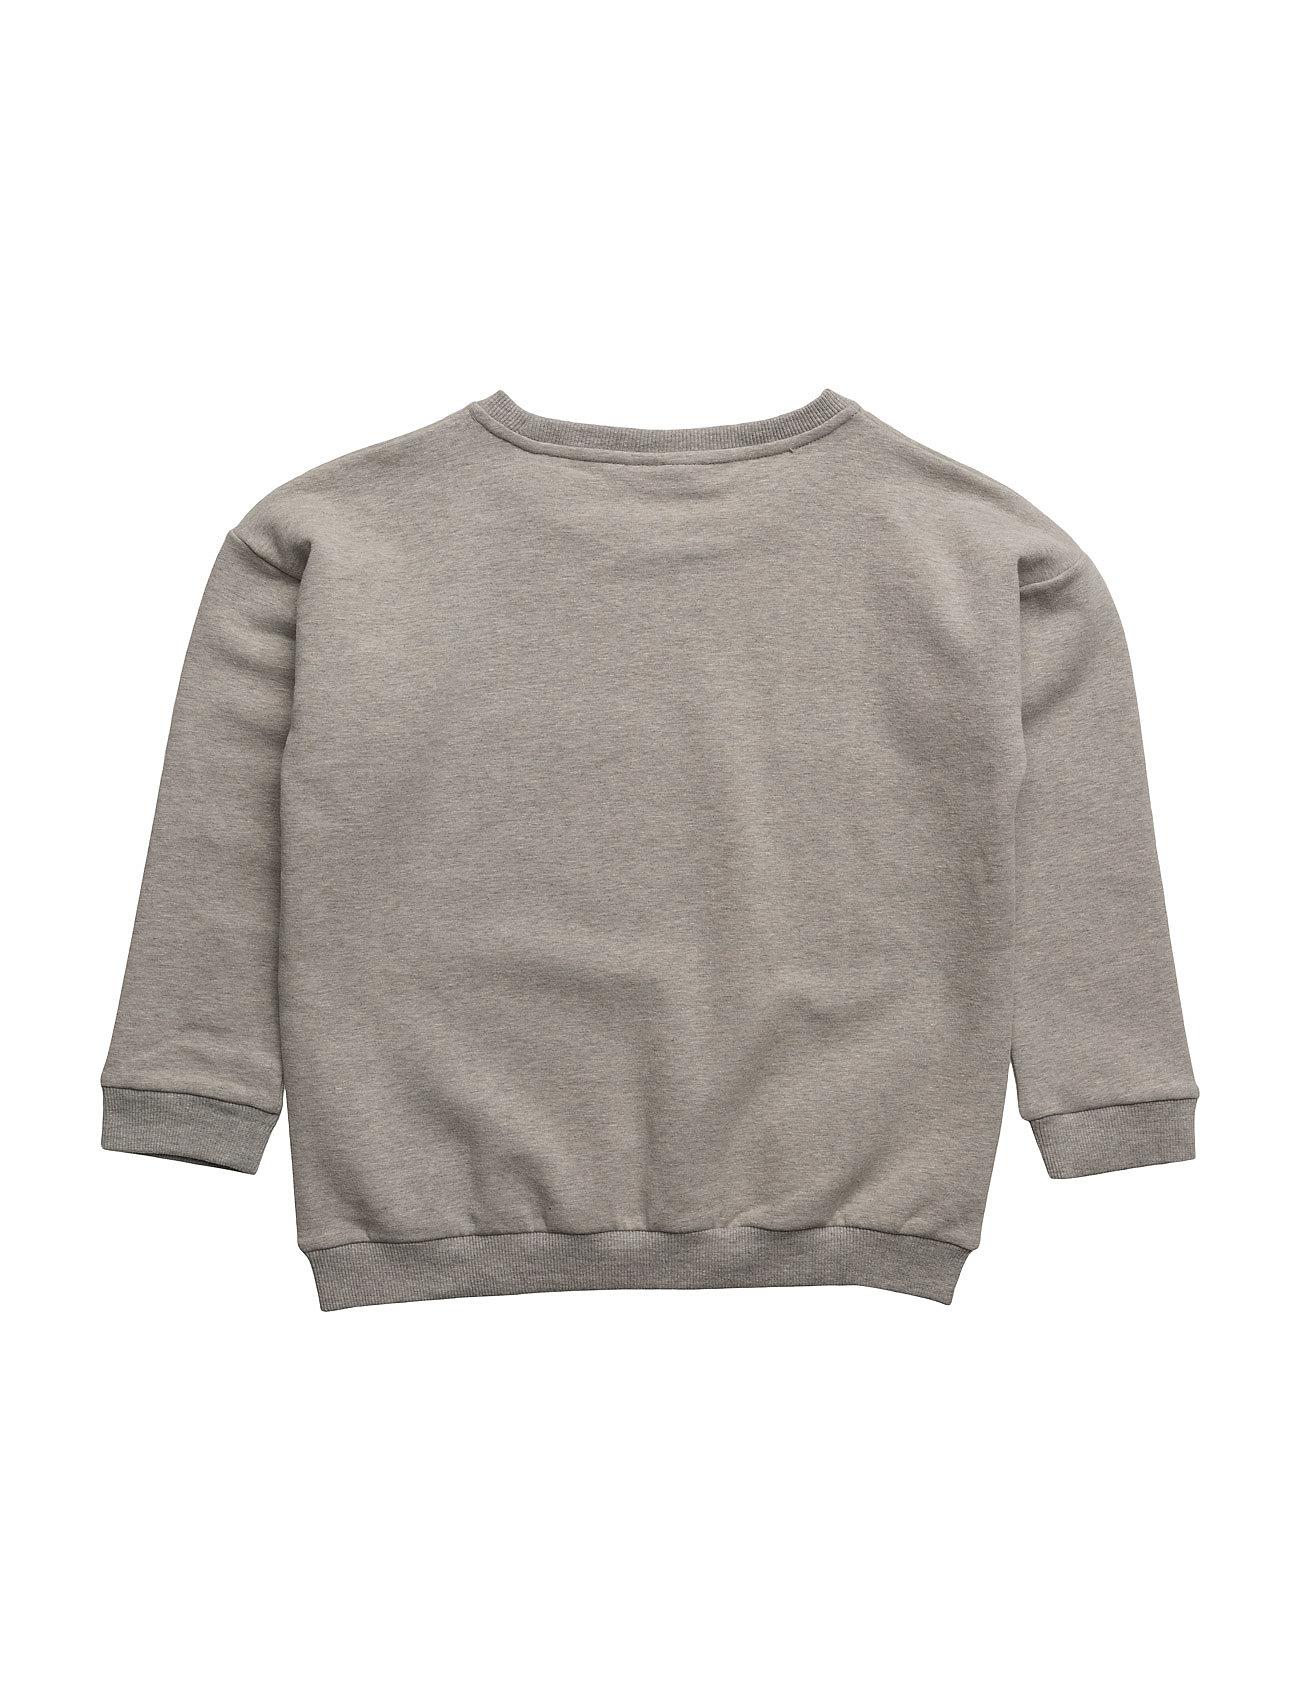 gardner & the gang – The classic sweat shirt conrad camel chestprint på boozt.com dk